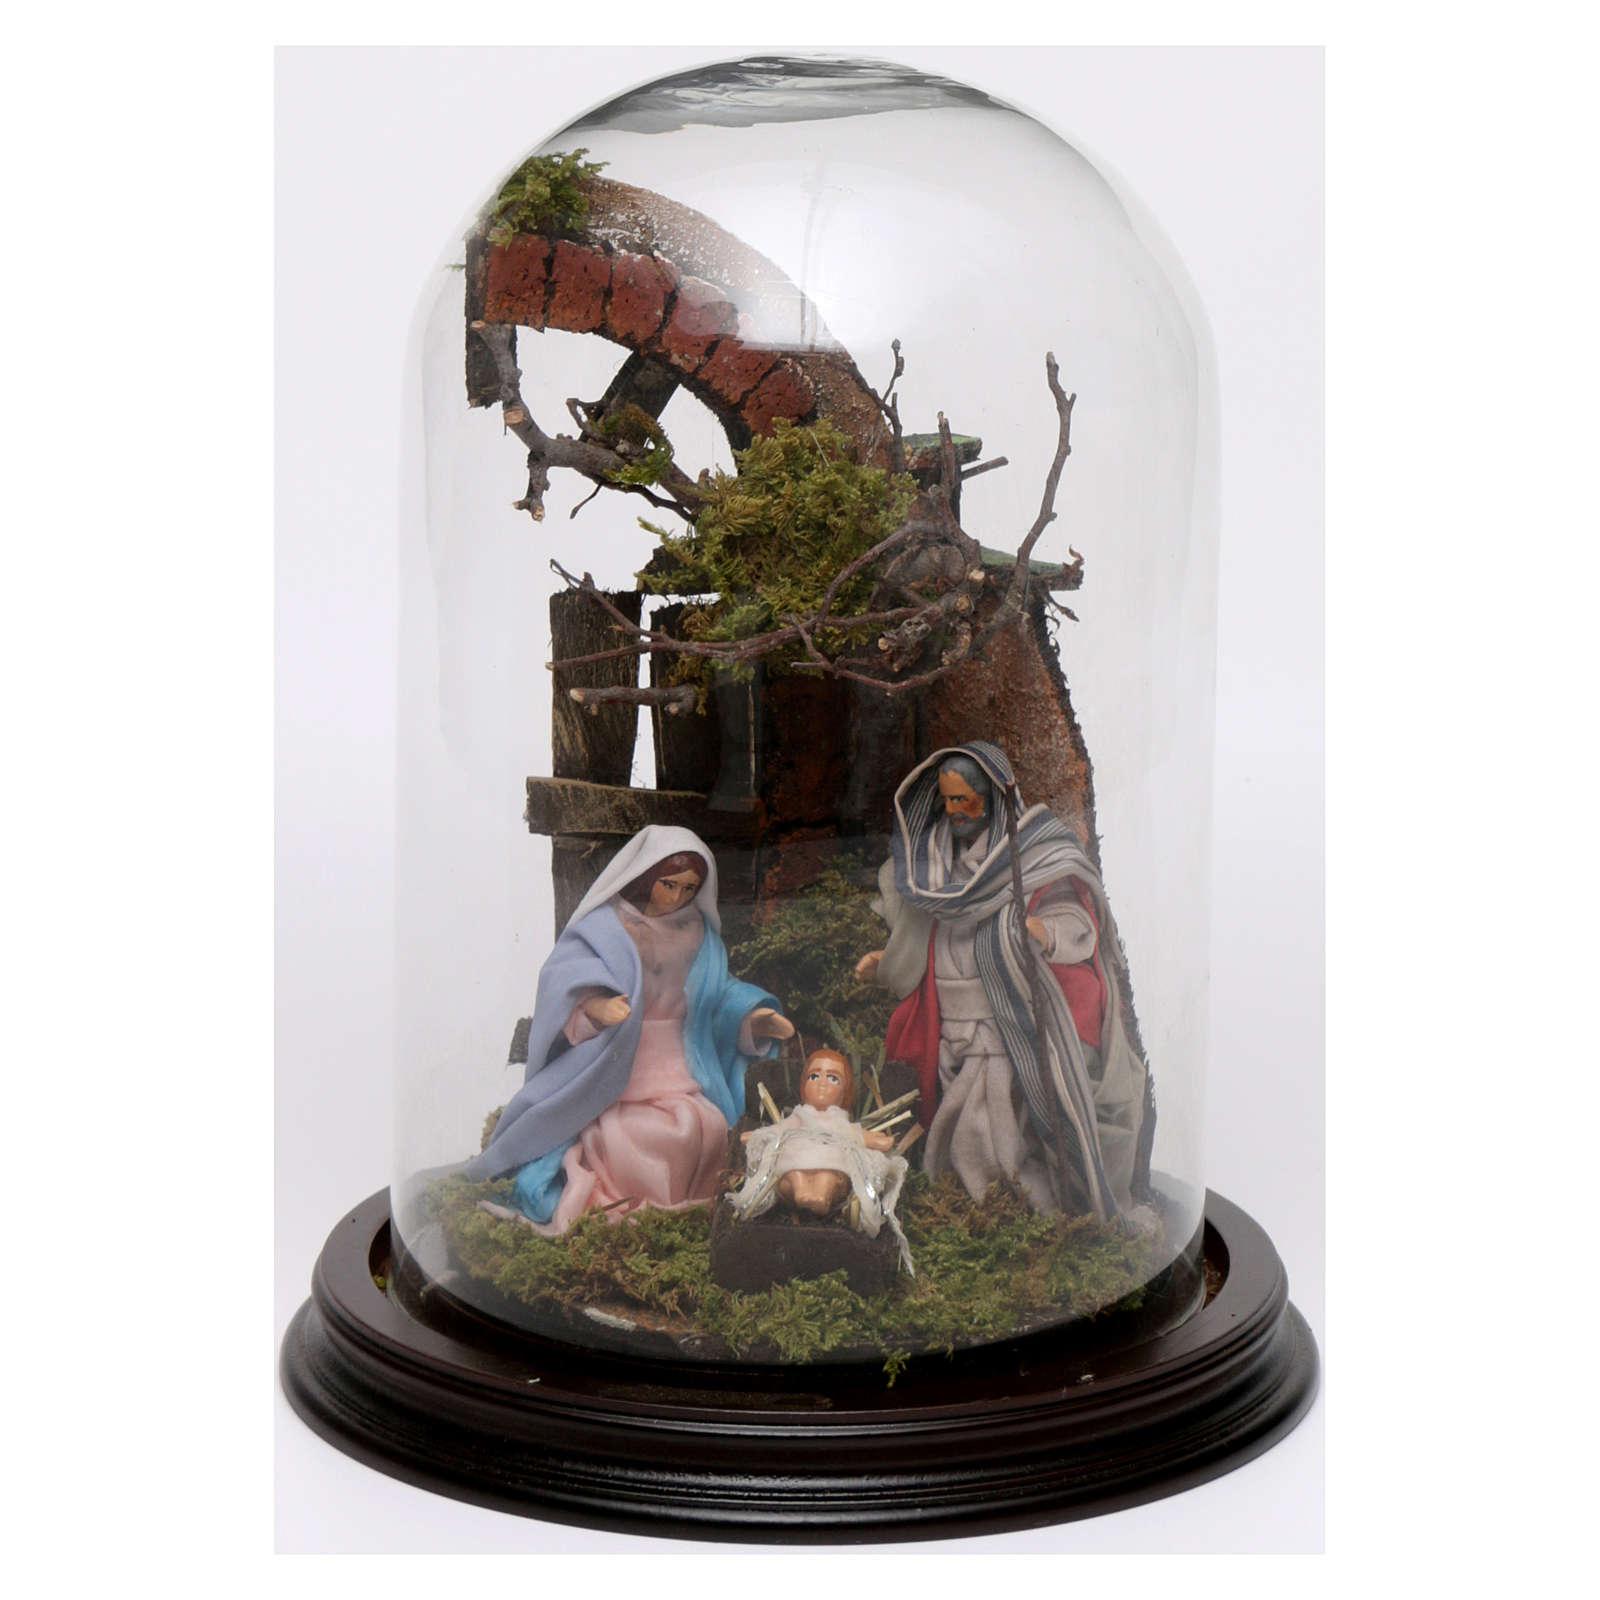 Escena Natividad 25x18 cm cúpula vidrio pesebre napolitano 4